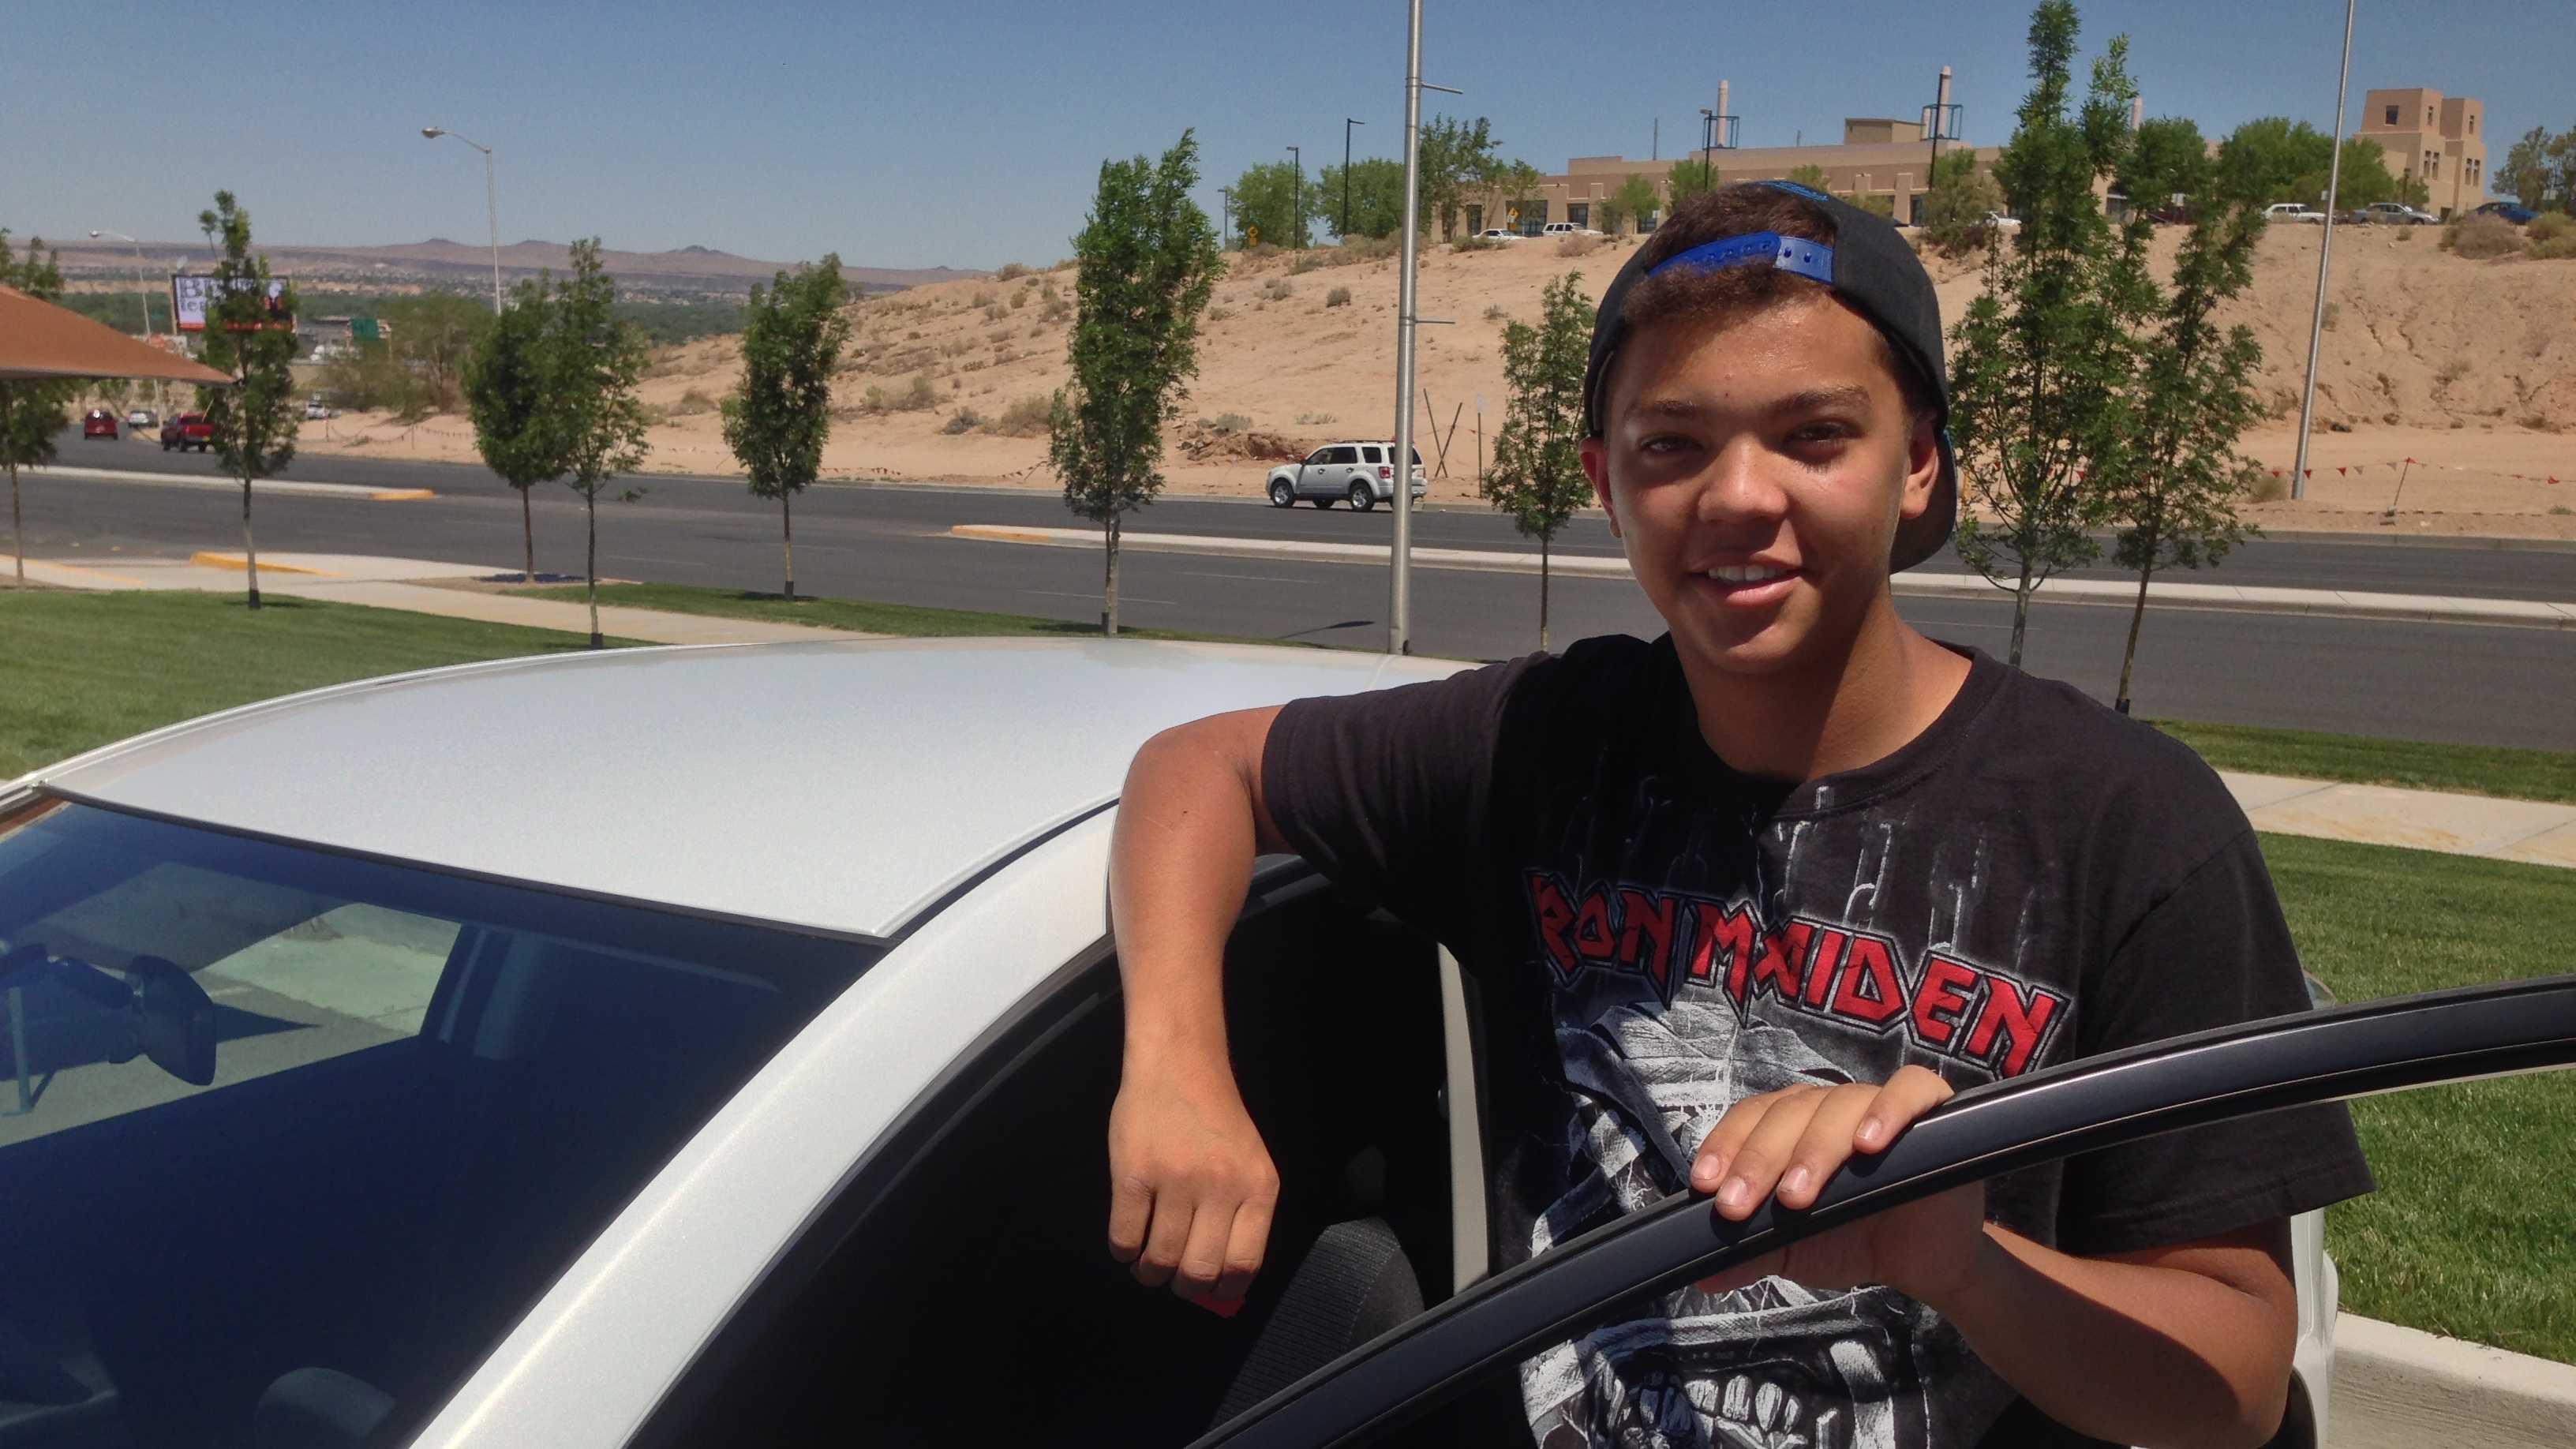 new car guy pic